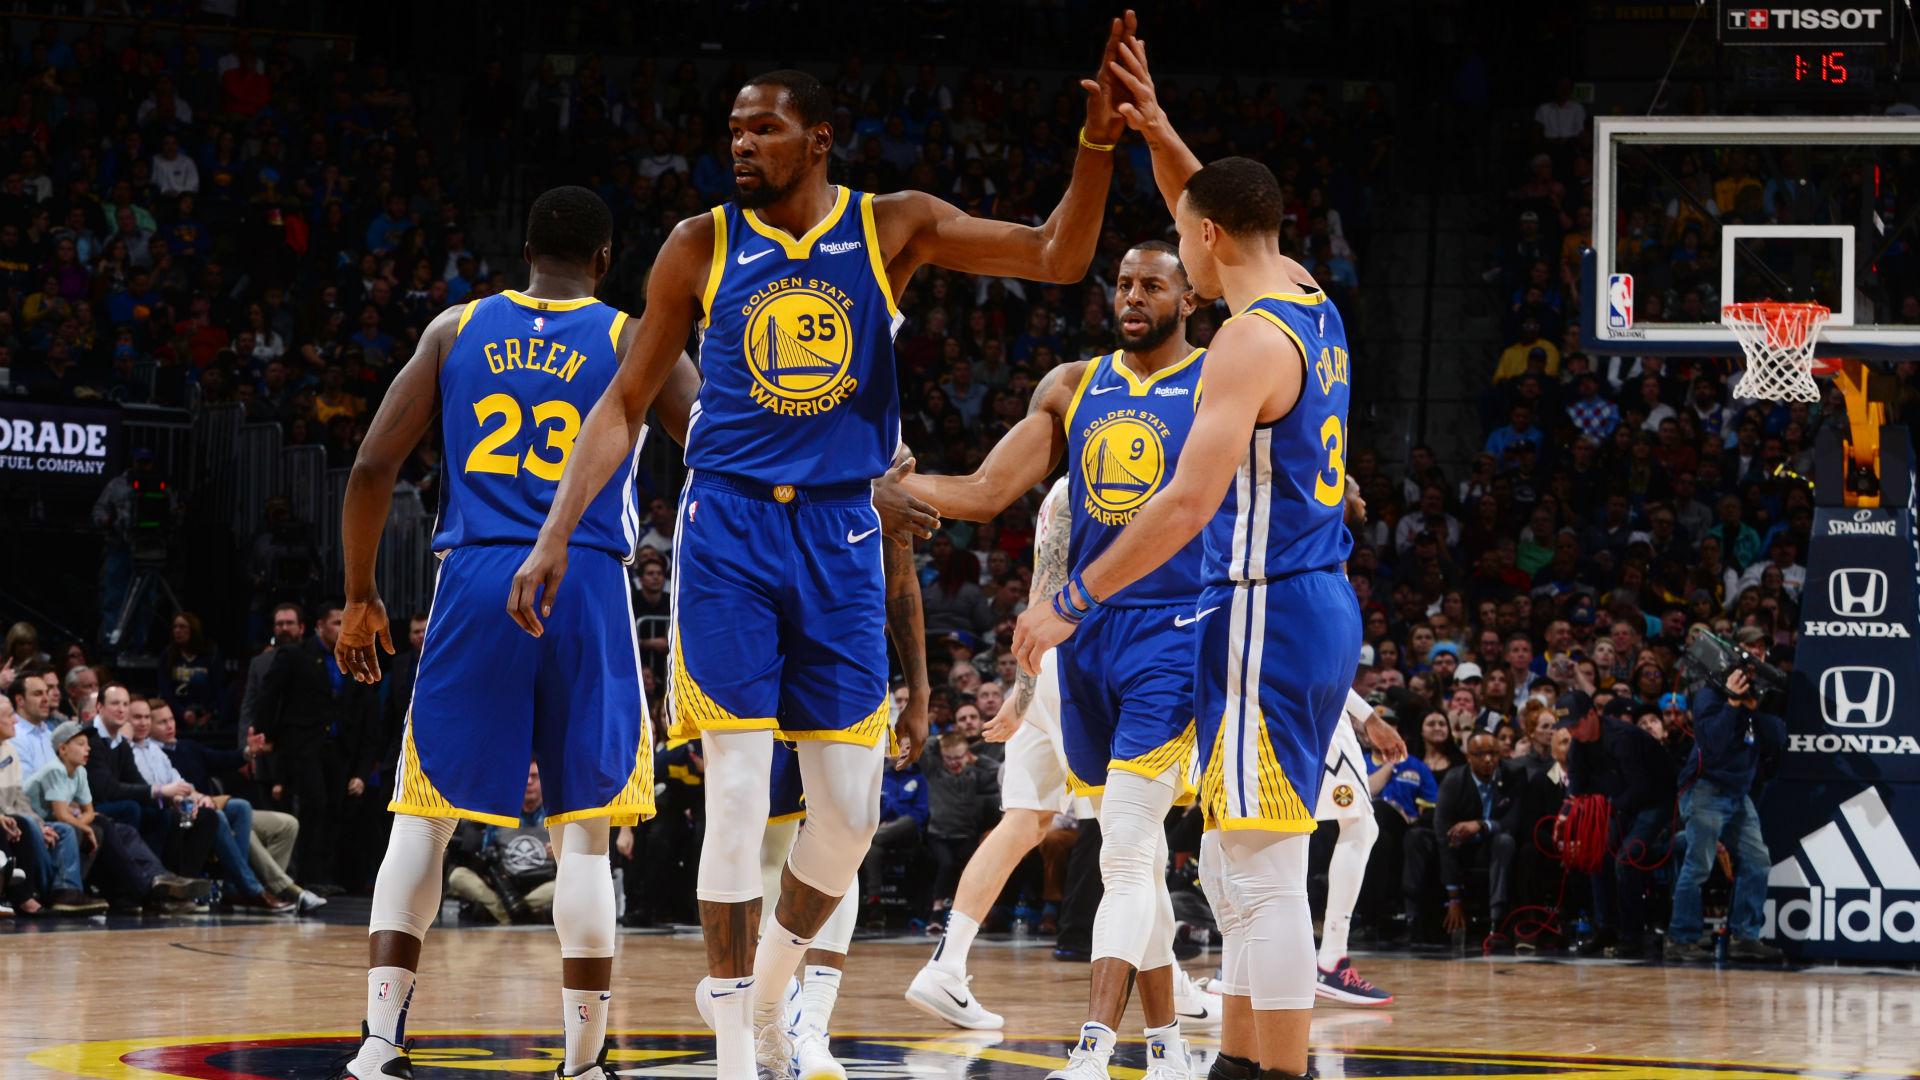 NBA Christmas Day 2018: Best all-time games on Christmas Day   NBA.com